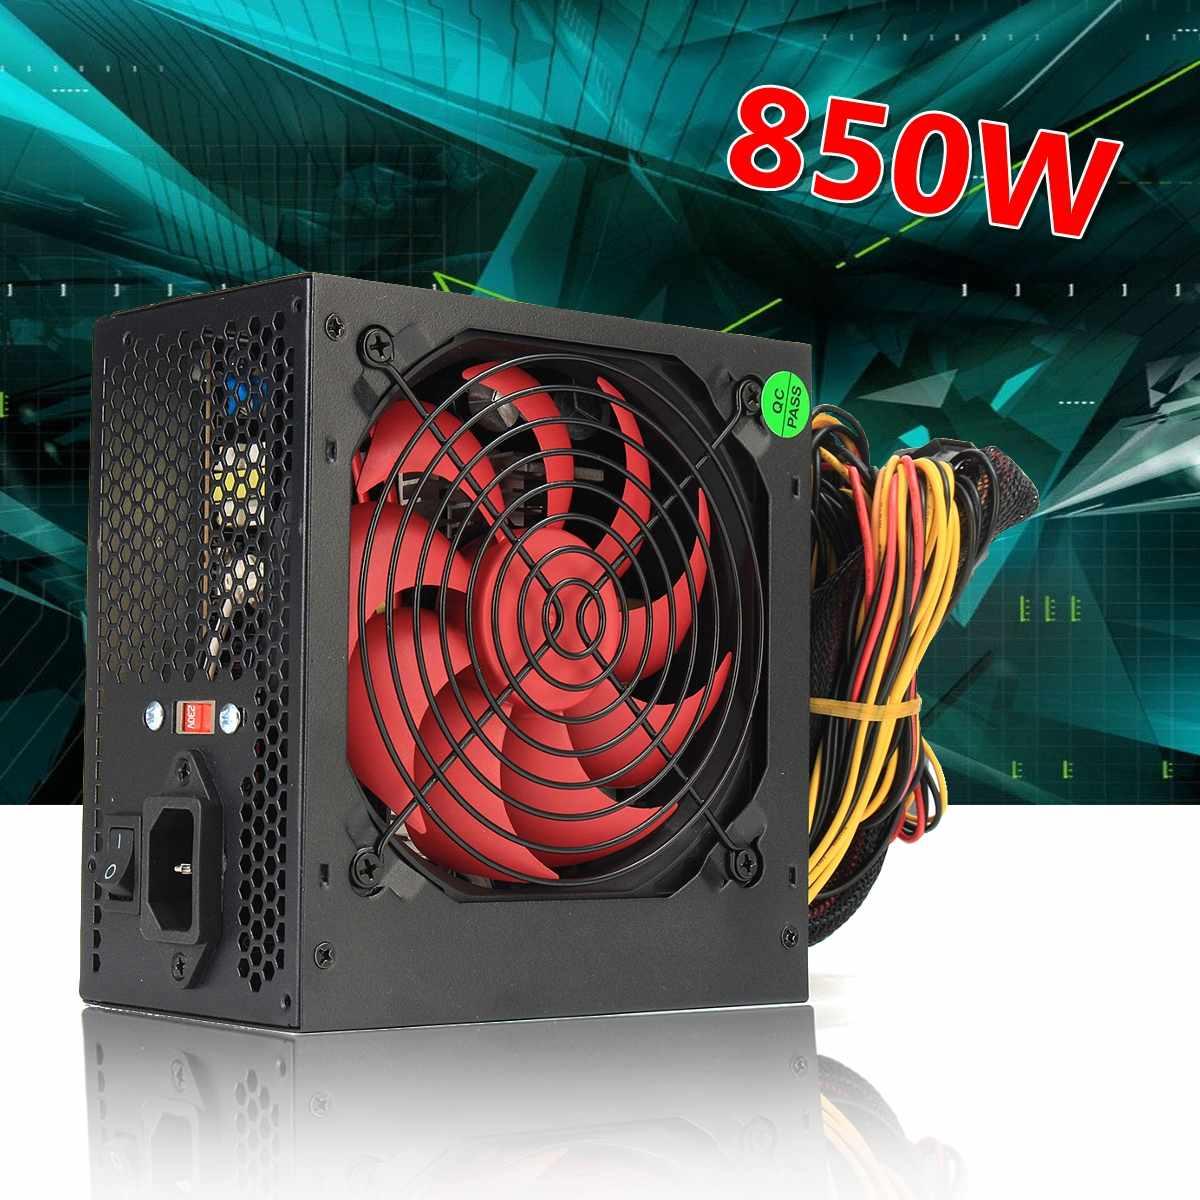 US/AU/EU Plug 850W BTC Power Supply 120mm Fan 24 Pin PCI SATA ATX 12V Molex Connect Miner Computer Power Supply